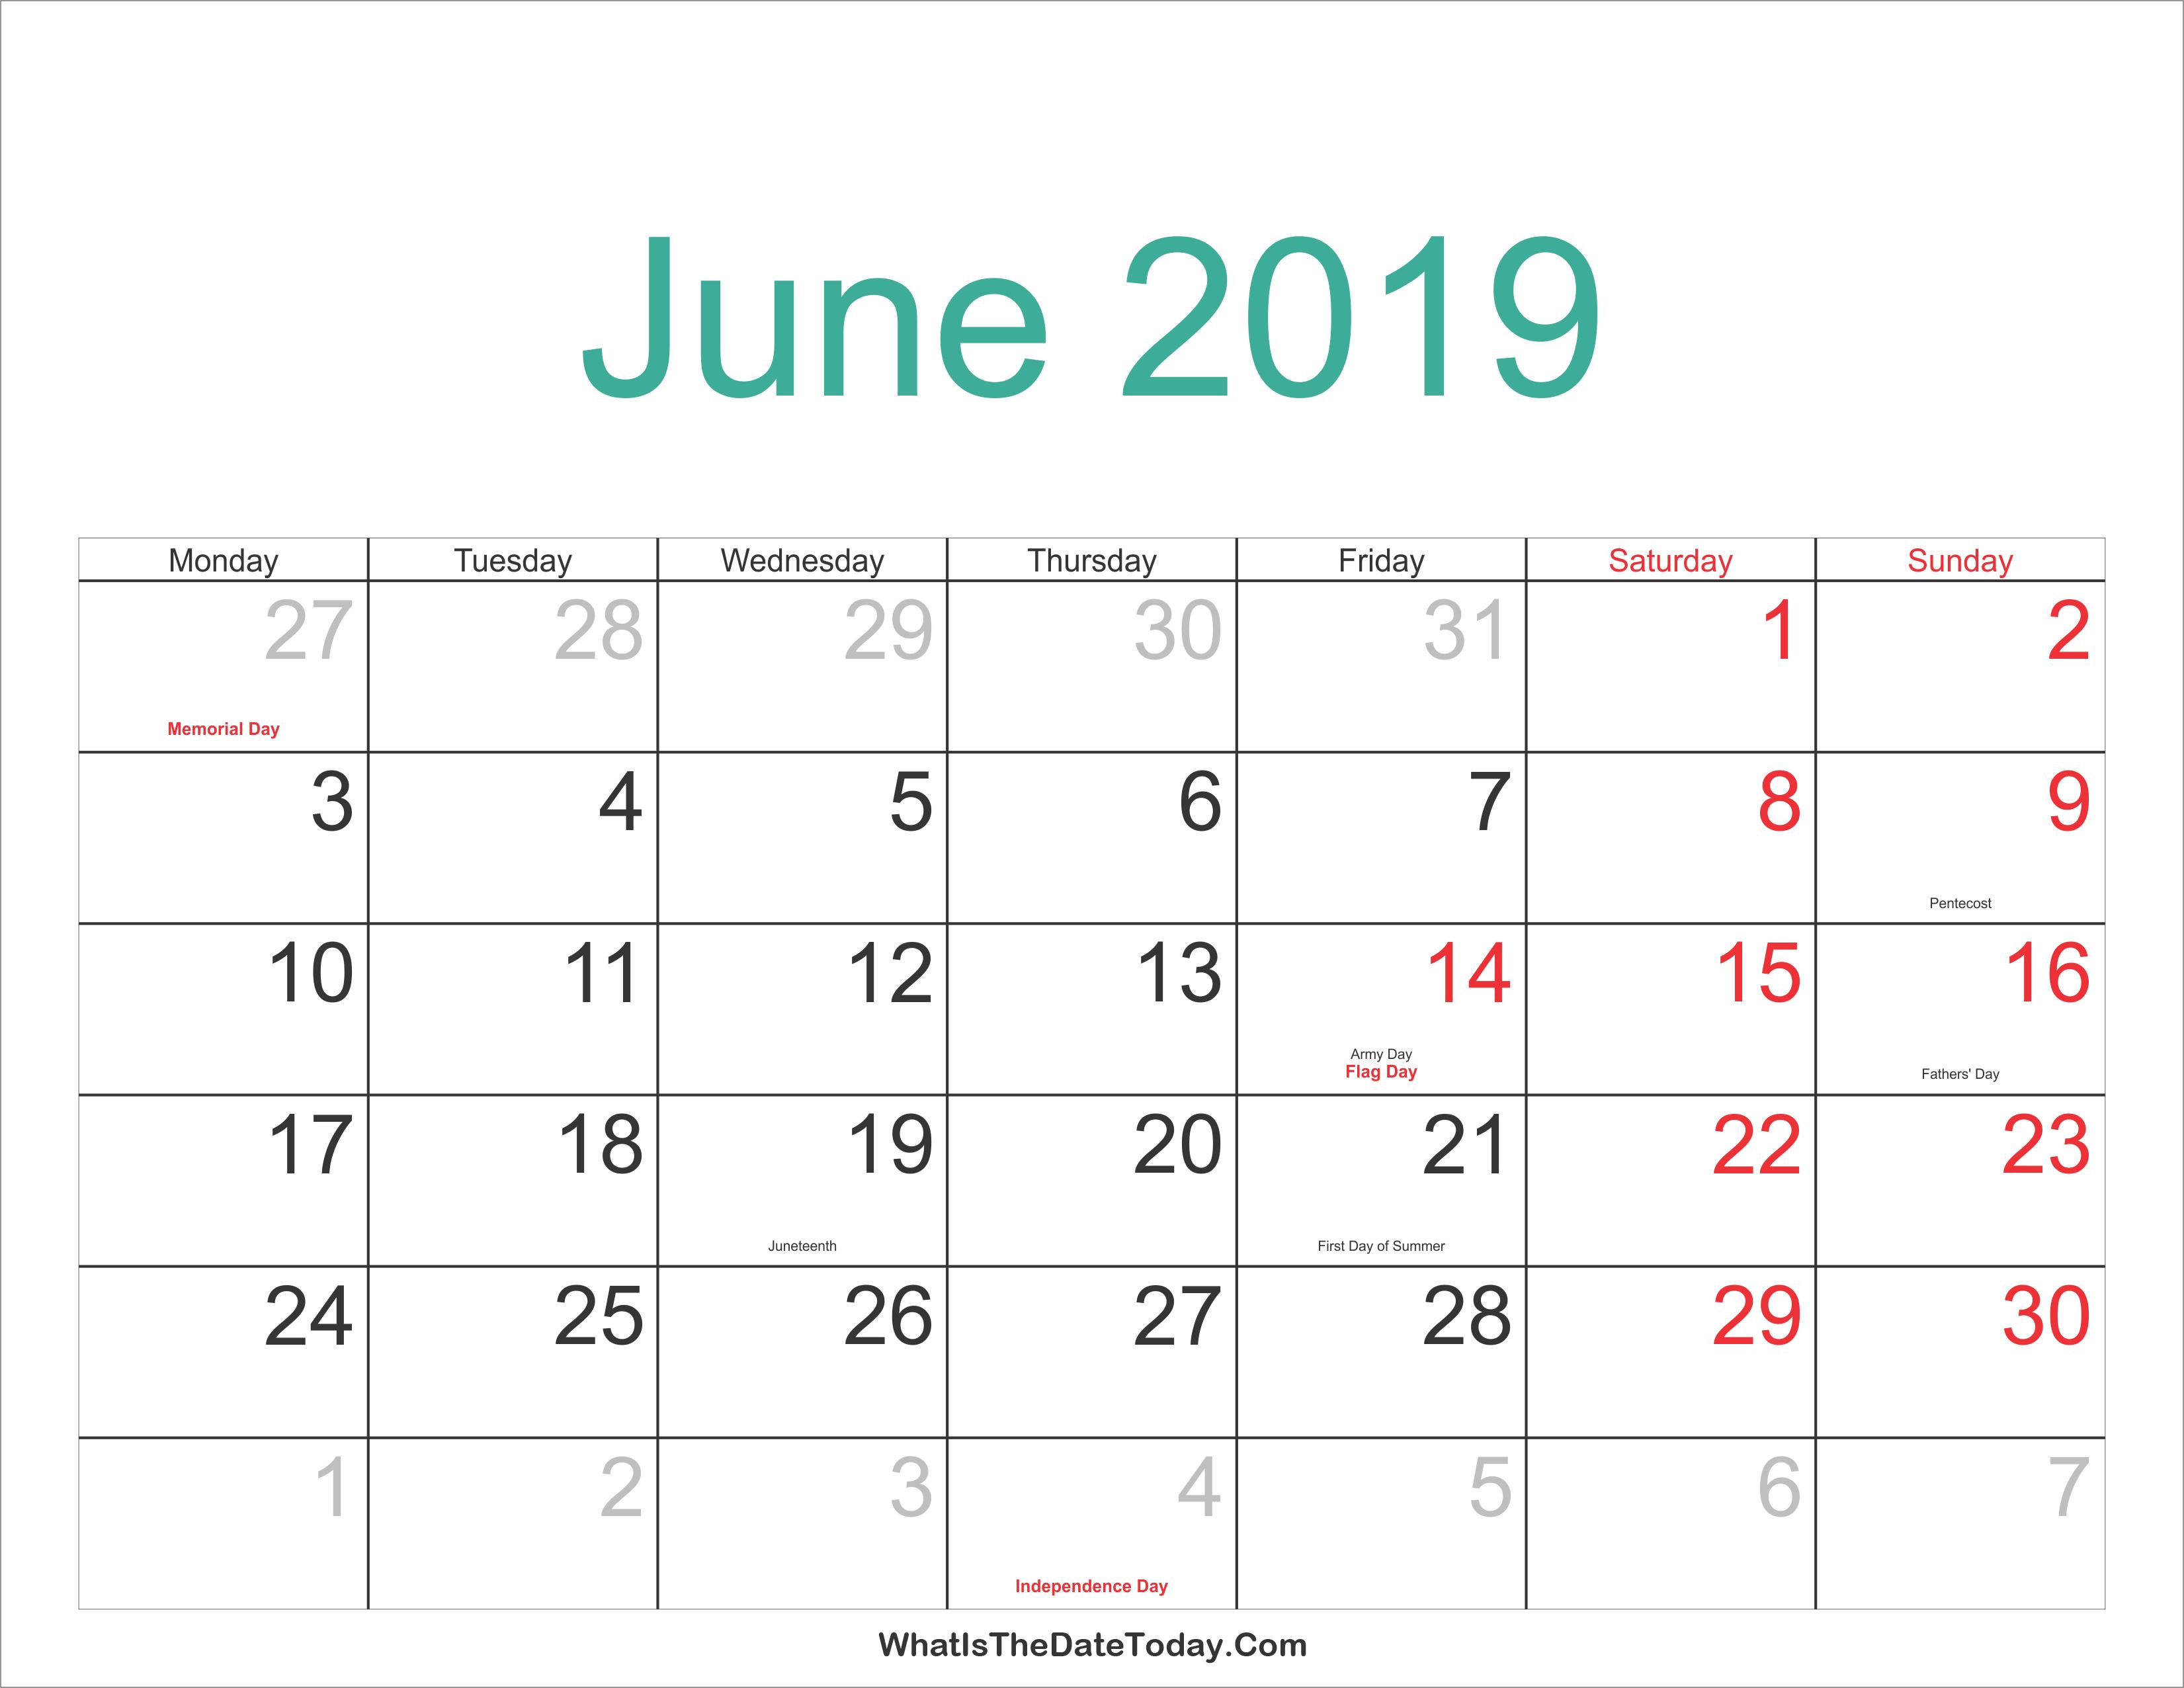 Blank Calendar For June 2019 Word - Printable Calendar 2019| Blank June 4 2019 Calendar